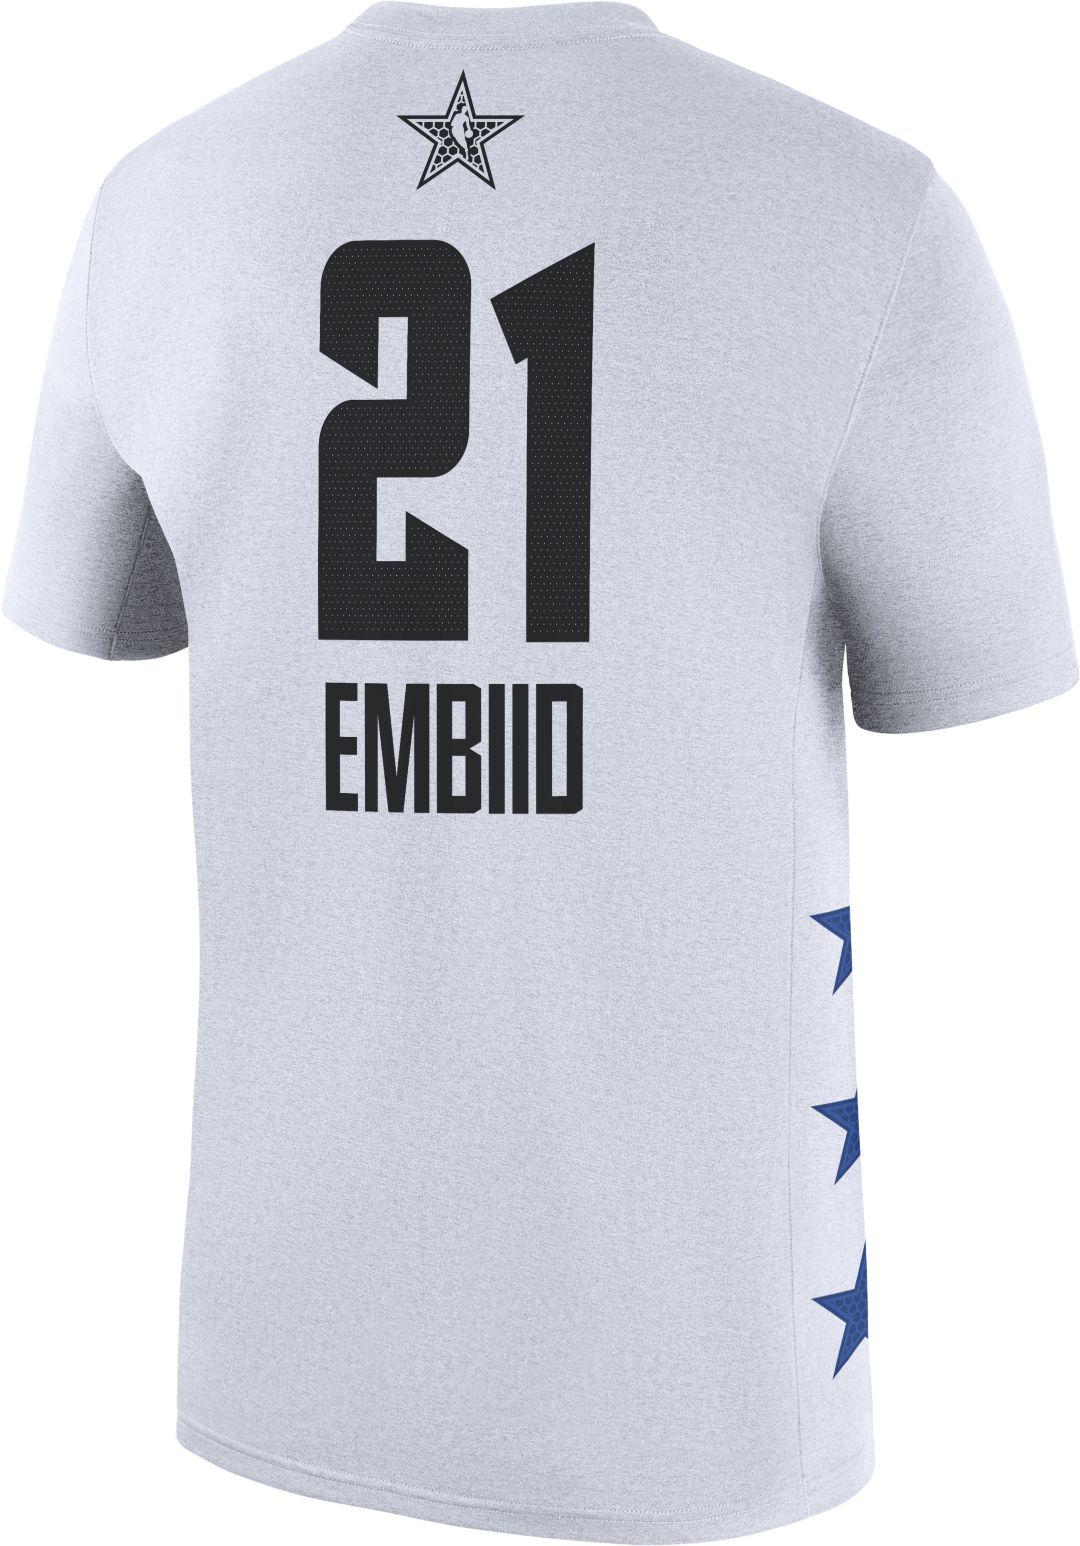 Fit Joel T Dri White Shirt All Men's Nba Jordan Star Game 2019 Embiid hQCxtrBsdo